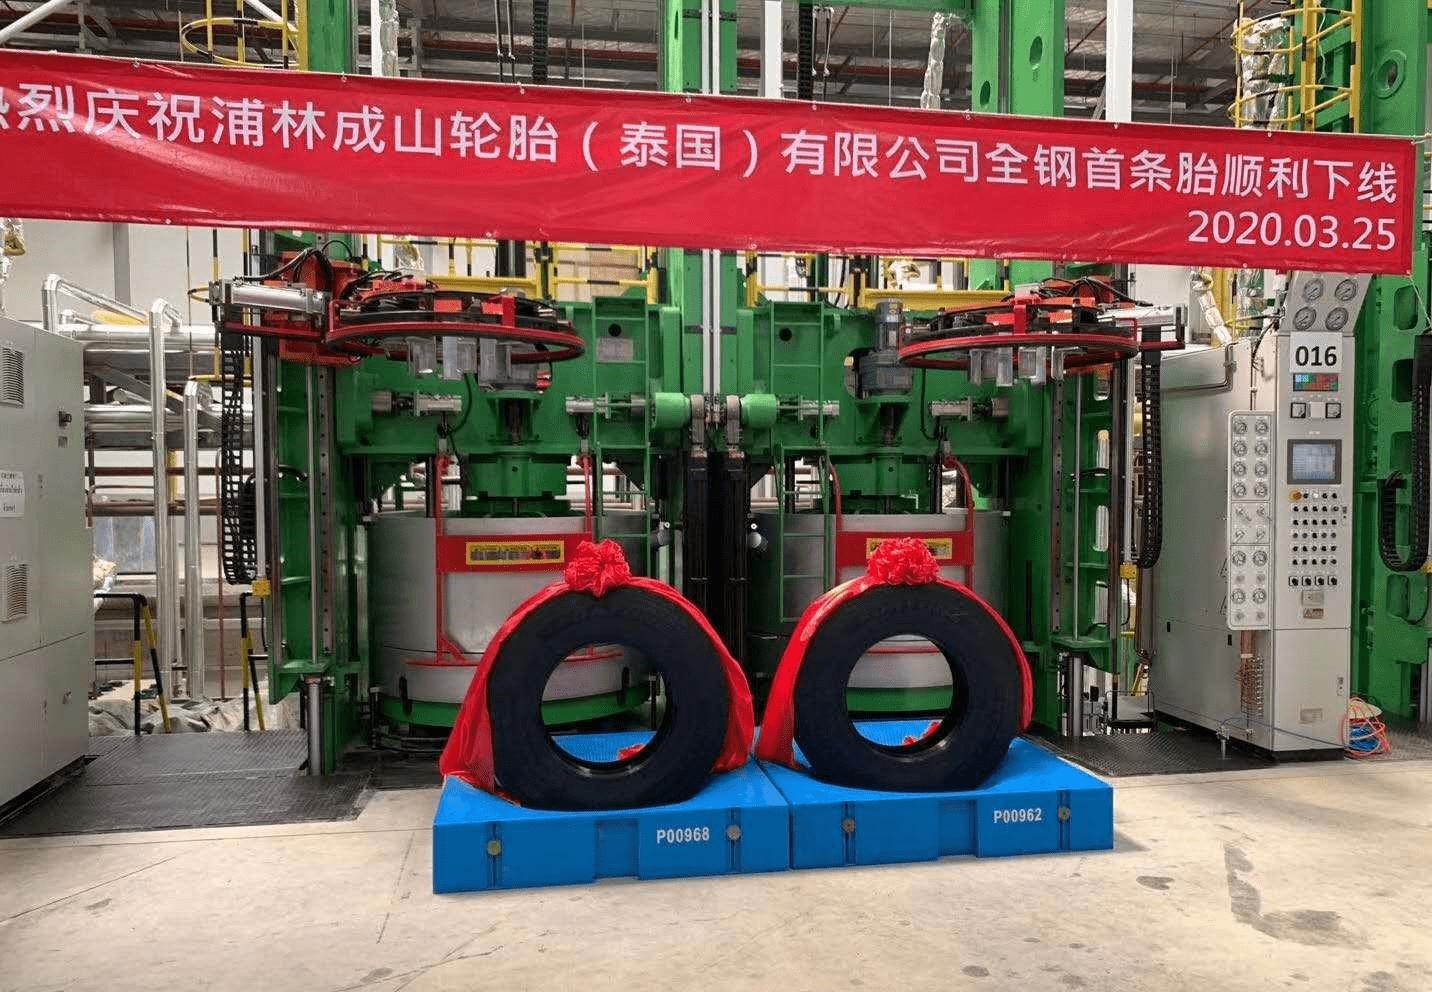 На новом заводе Prinx Chengshan в Таиланде выпущена первая TBR-шина